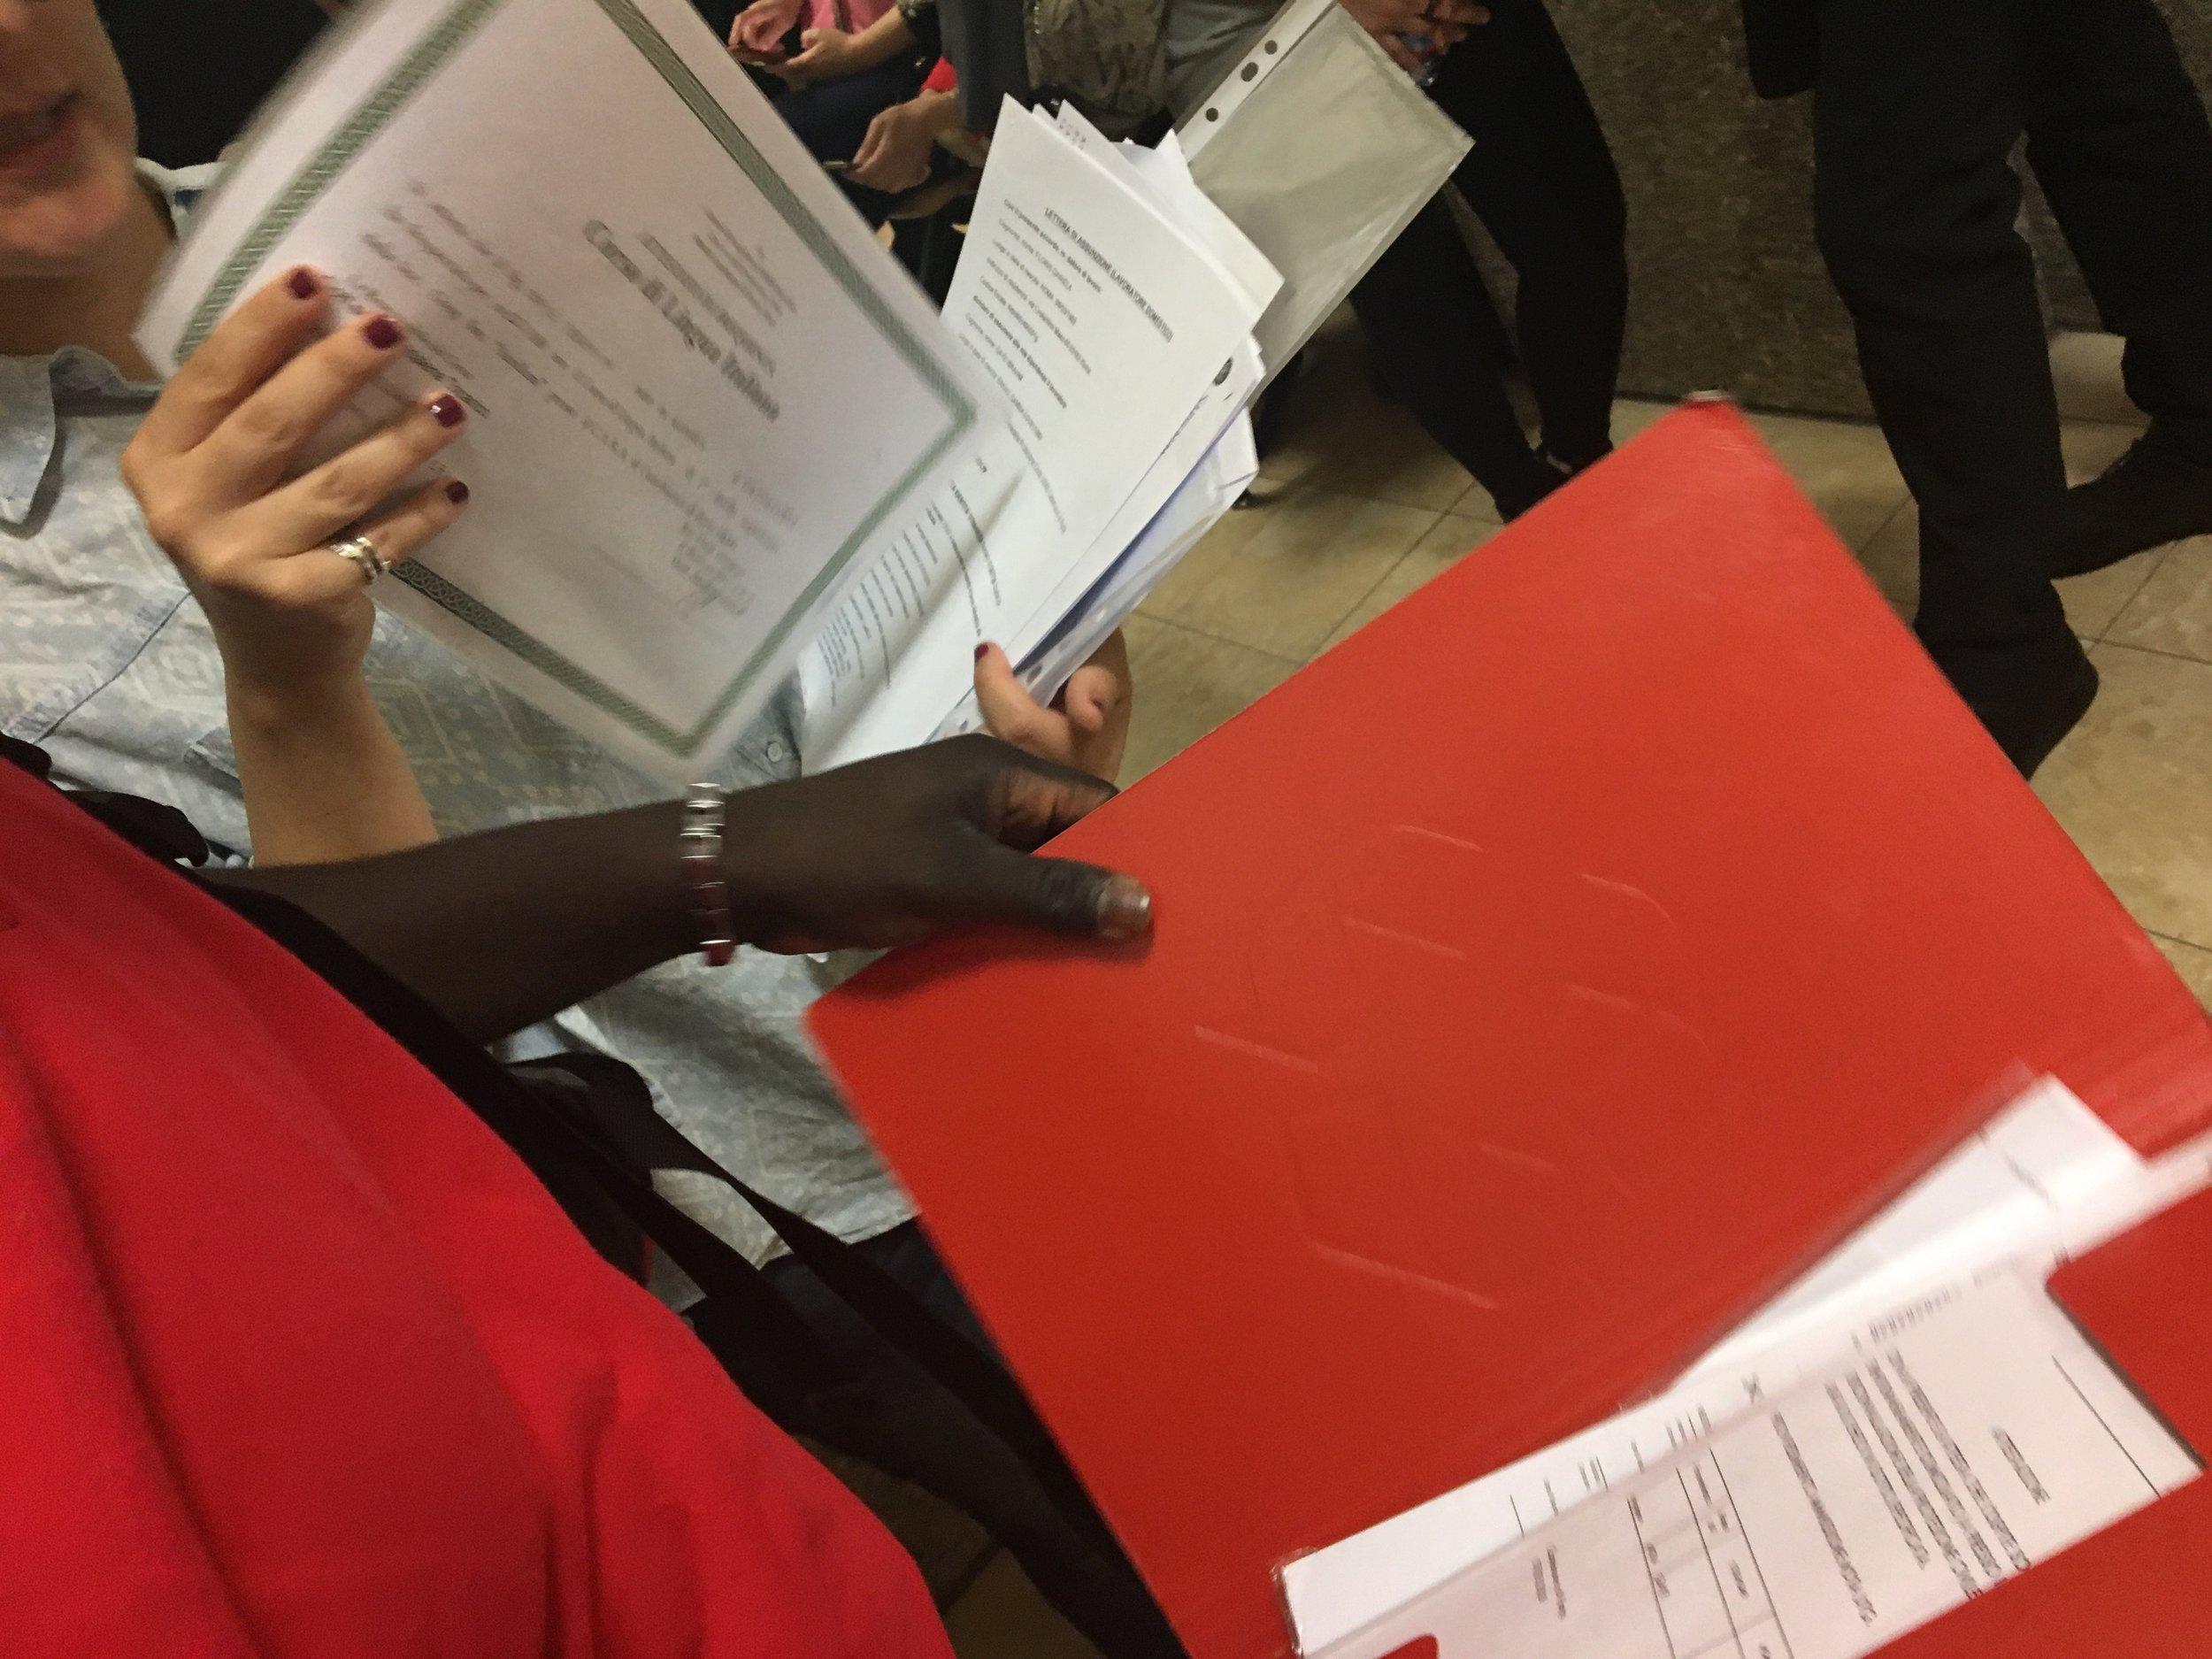 Pazi and his teacher organize his paperwork before seeing the judge. Rome, Italy; 24 April 2018. © Pamela Kerpius